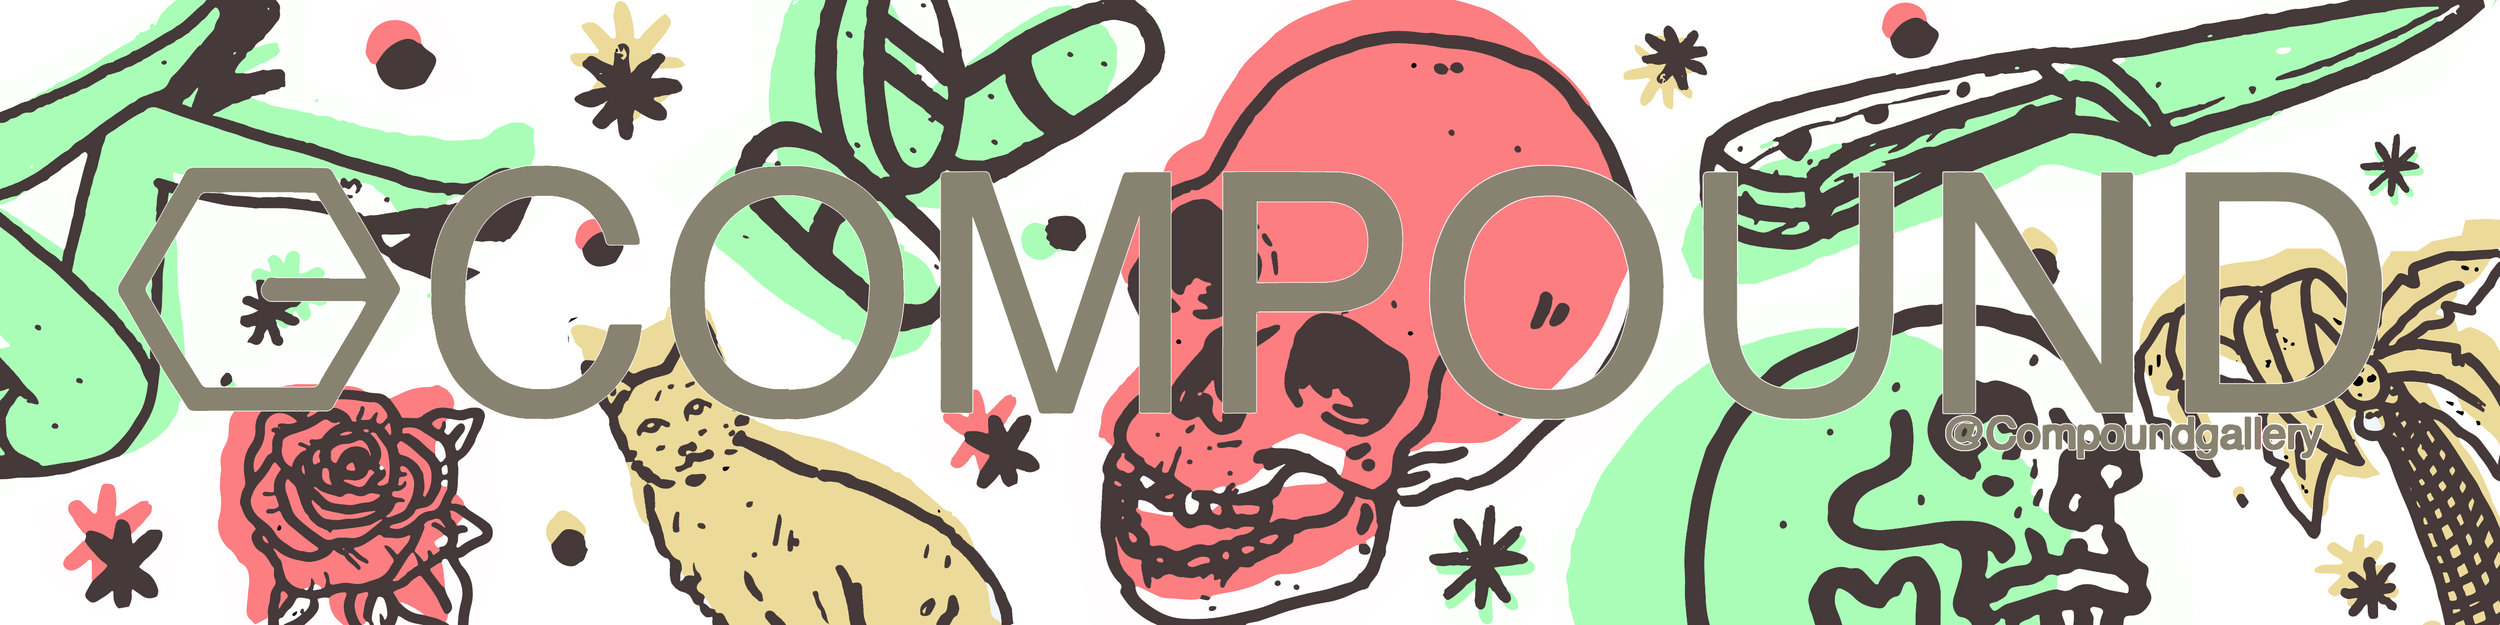 Sticker & Banner designs for Compound Gallery, Portland Oregon